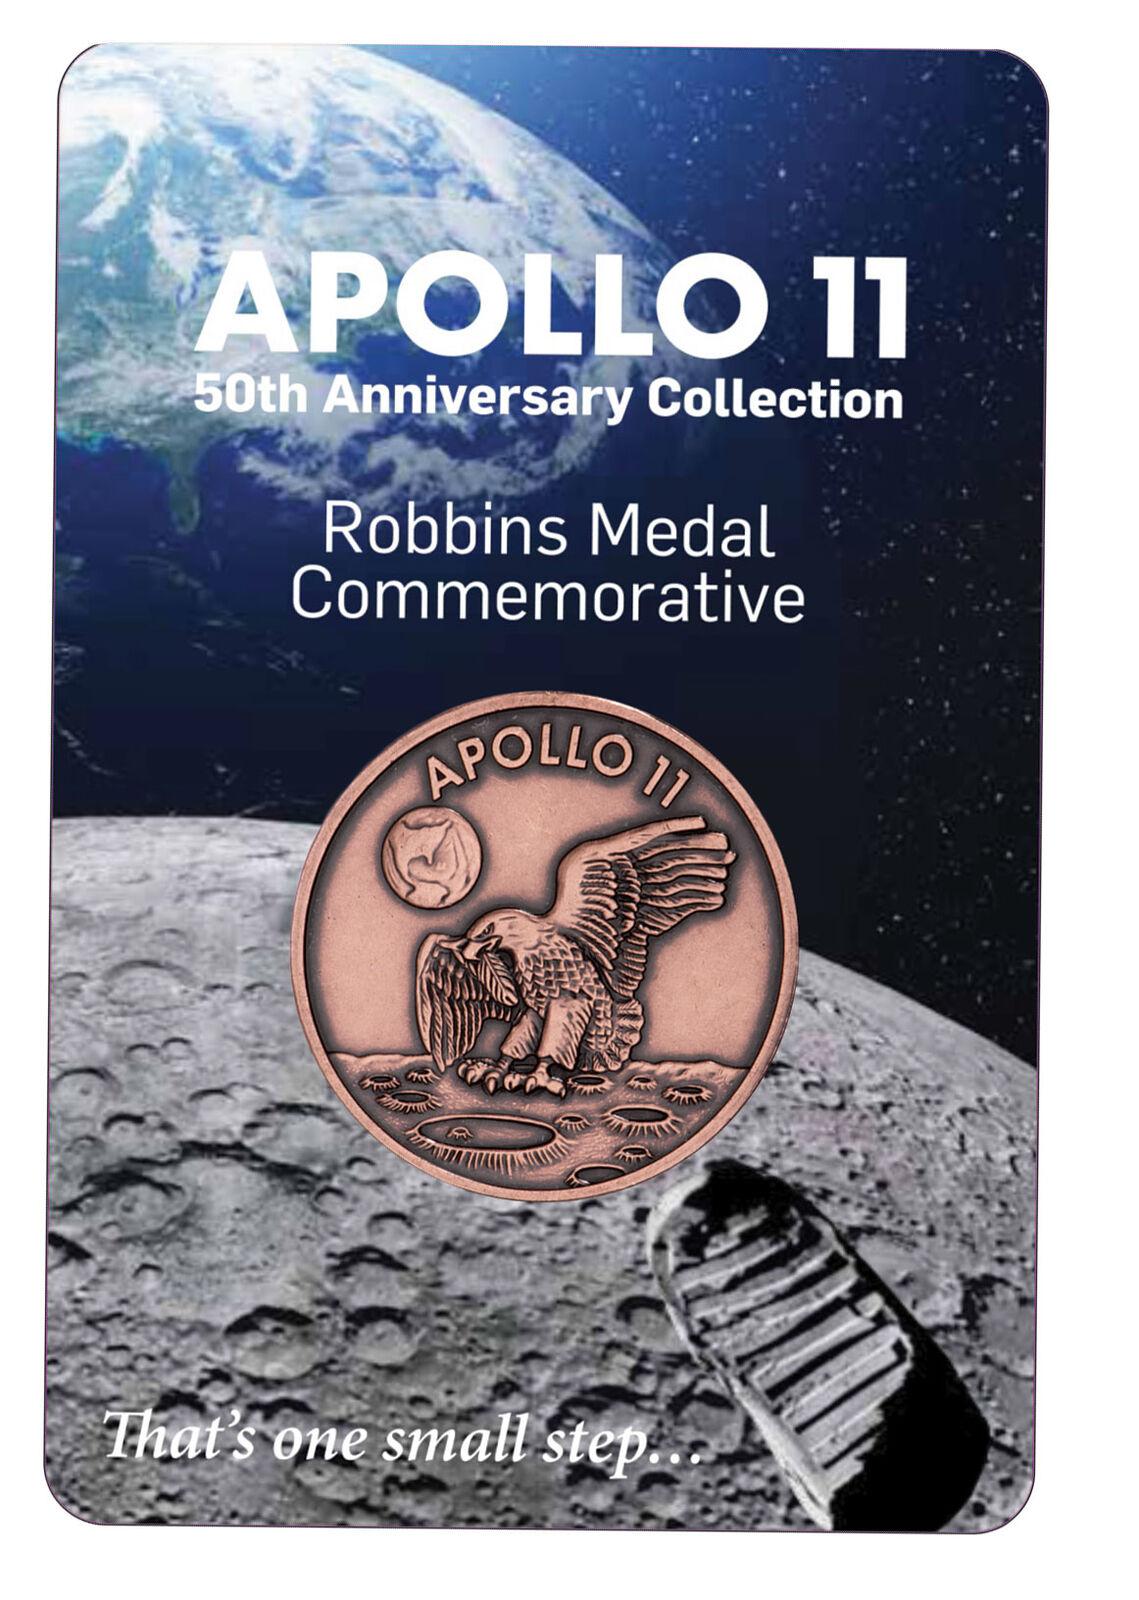 1969-2019 Apollo 11 Robbins Medals 1 oz Copper Antiqued Medal Gem BU SKU54912